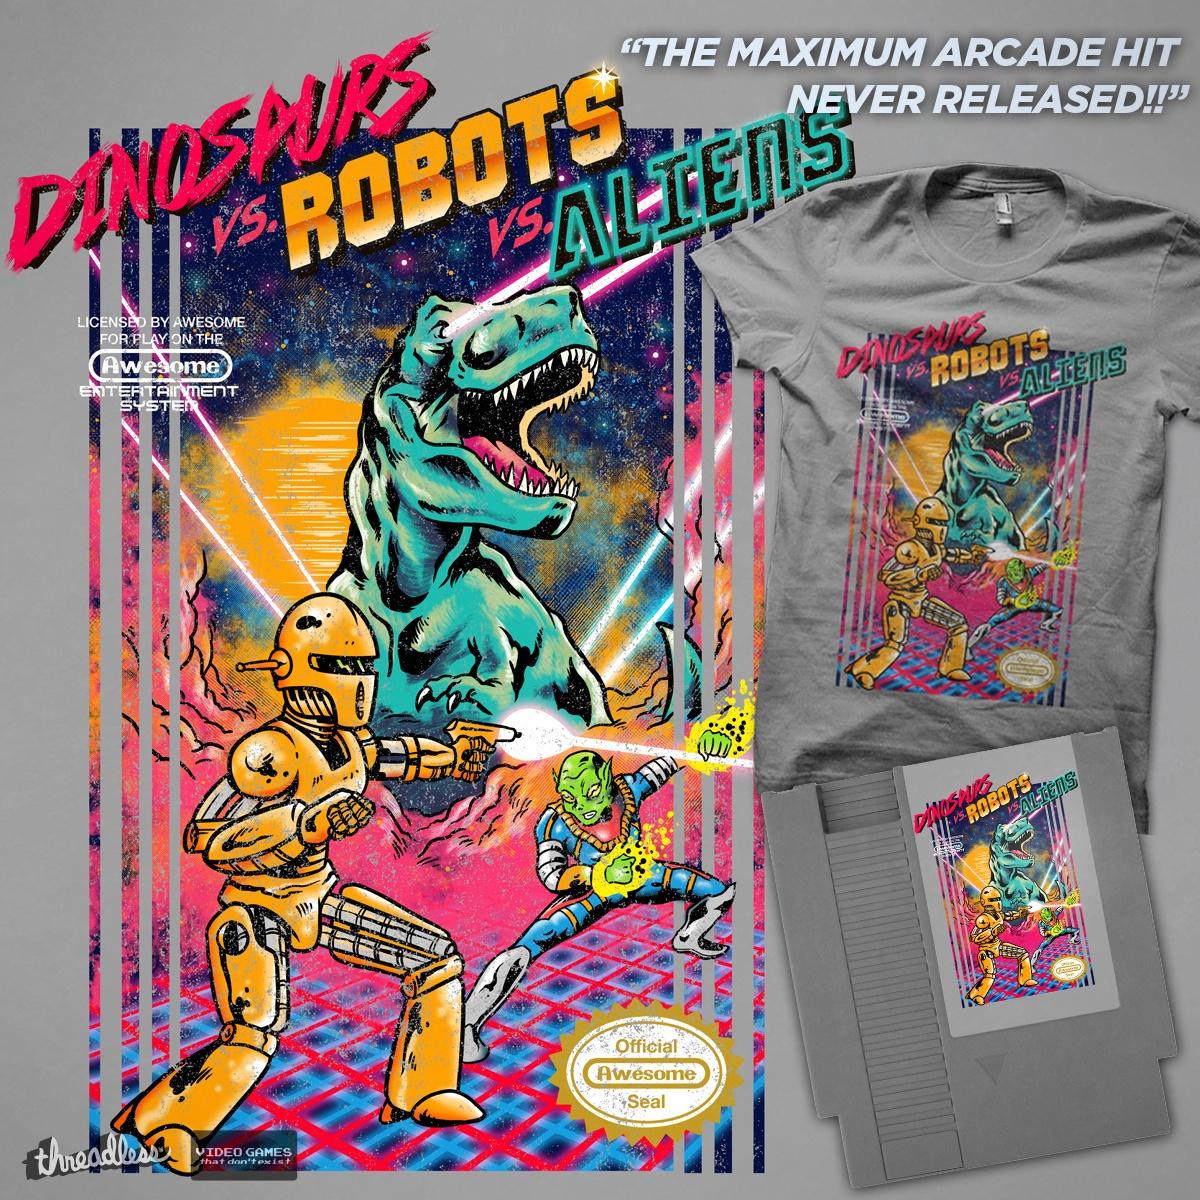 Aliens Robot Robots vs Aliens by